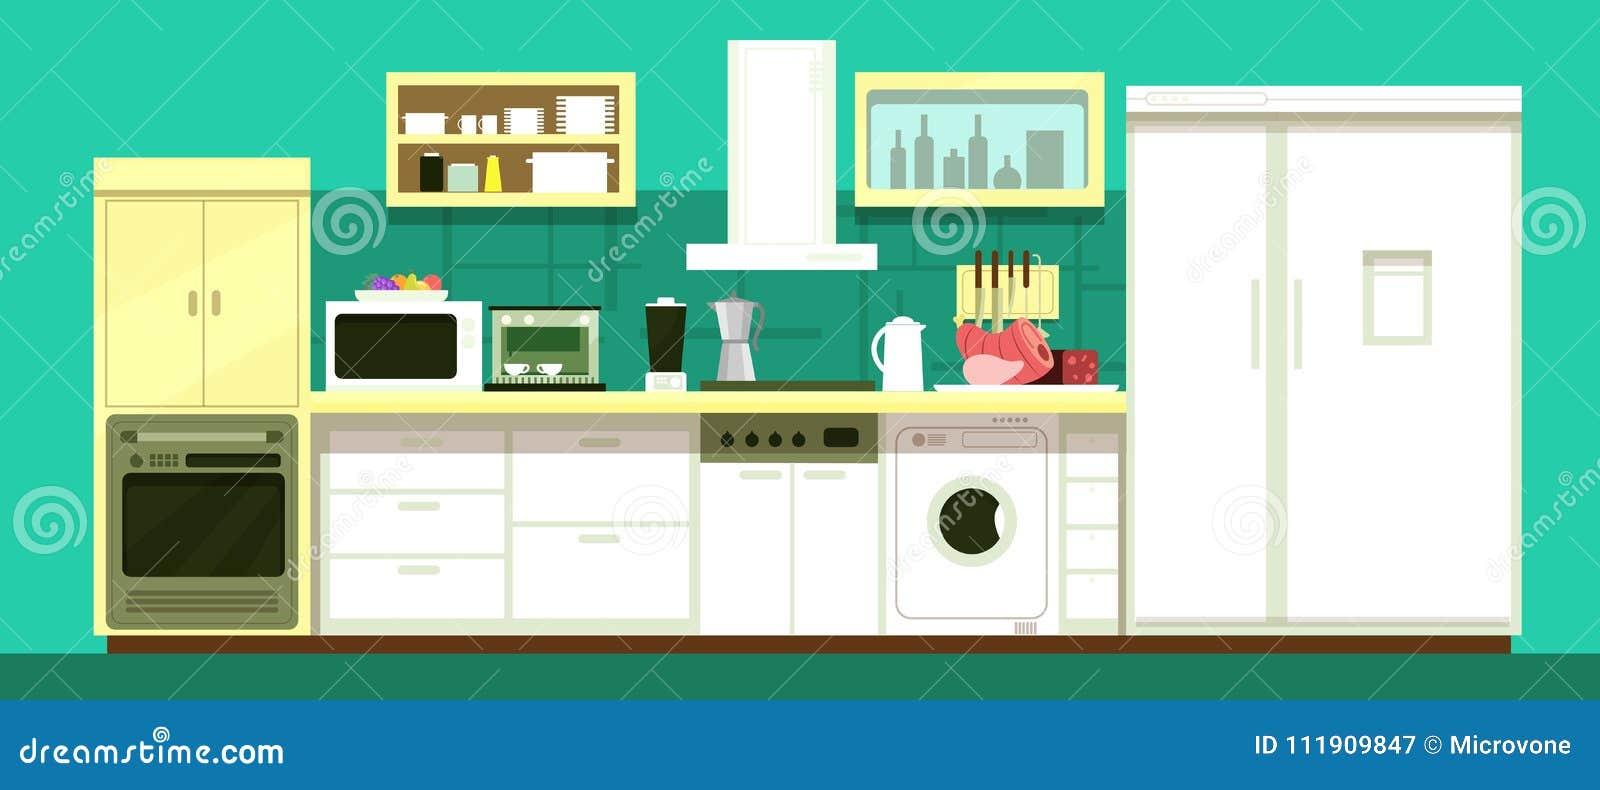 Nobody Cartoon Kitchen Room Vector Interior Stock Vector ...